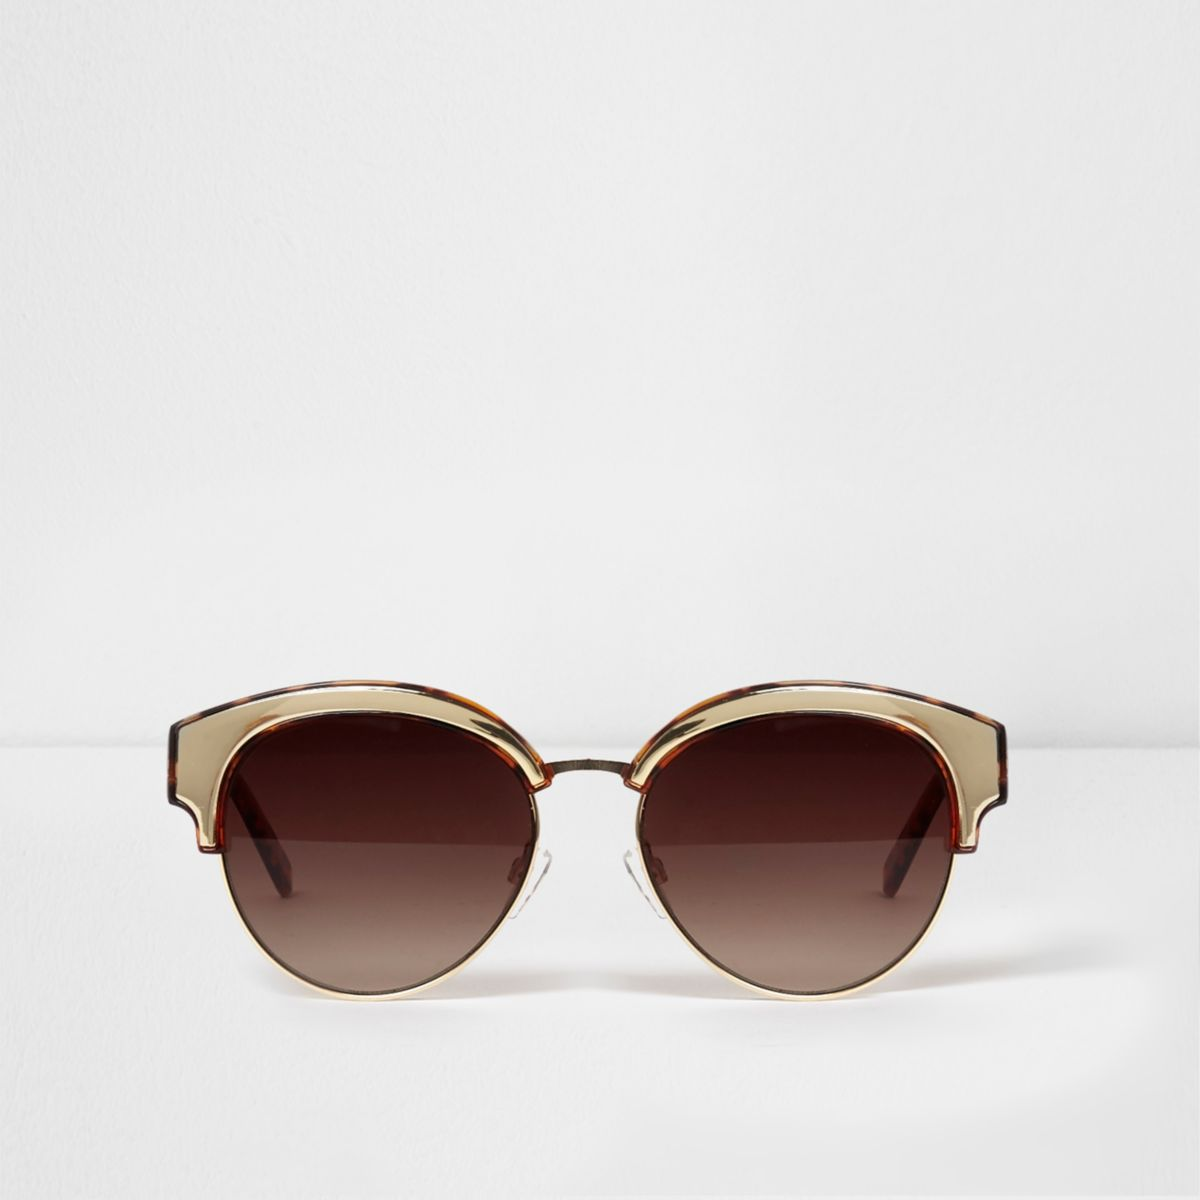 Brown tortoiseshell and gold tone sunglasses